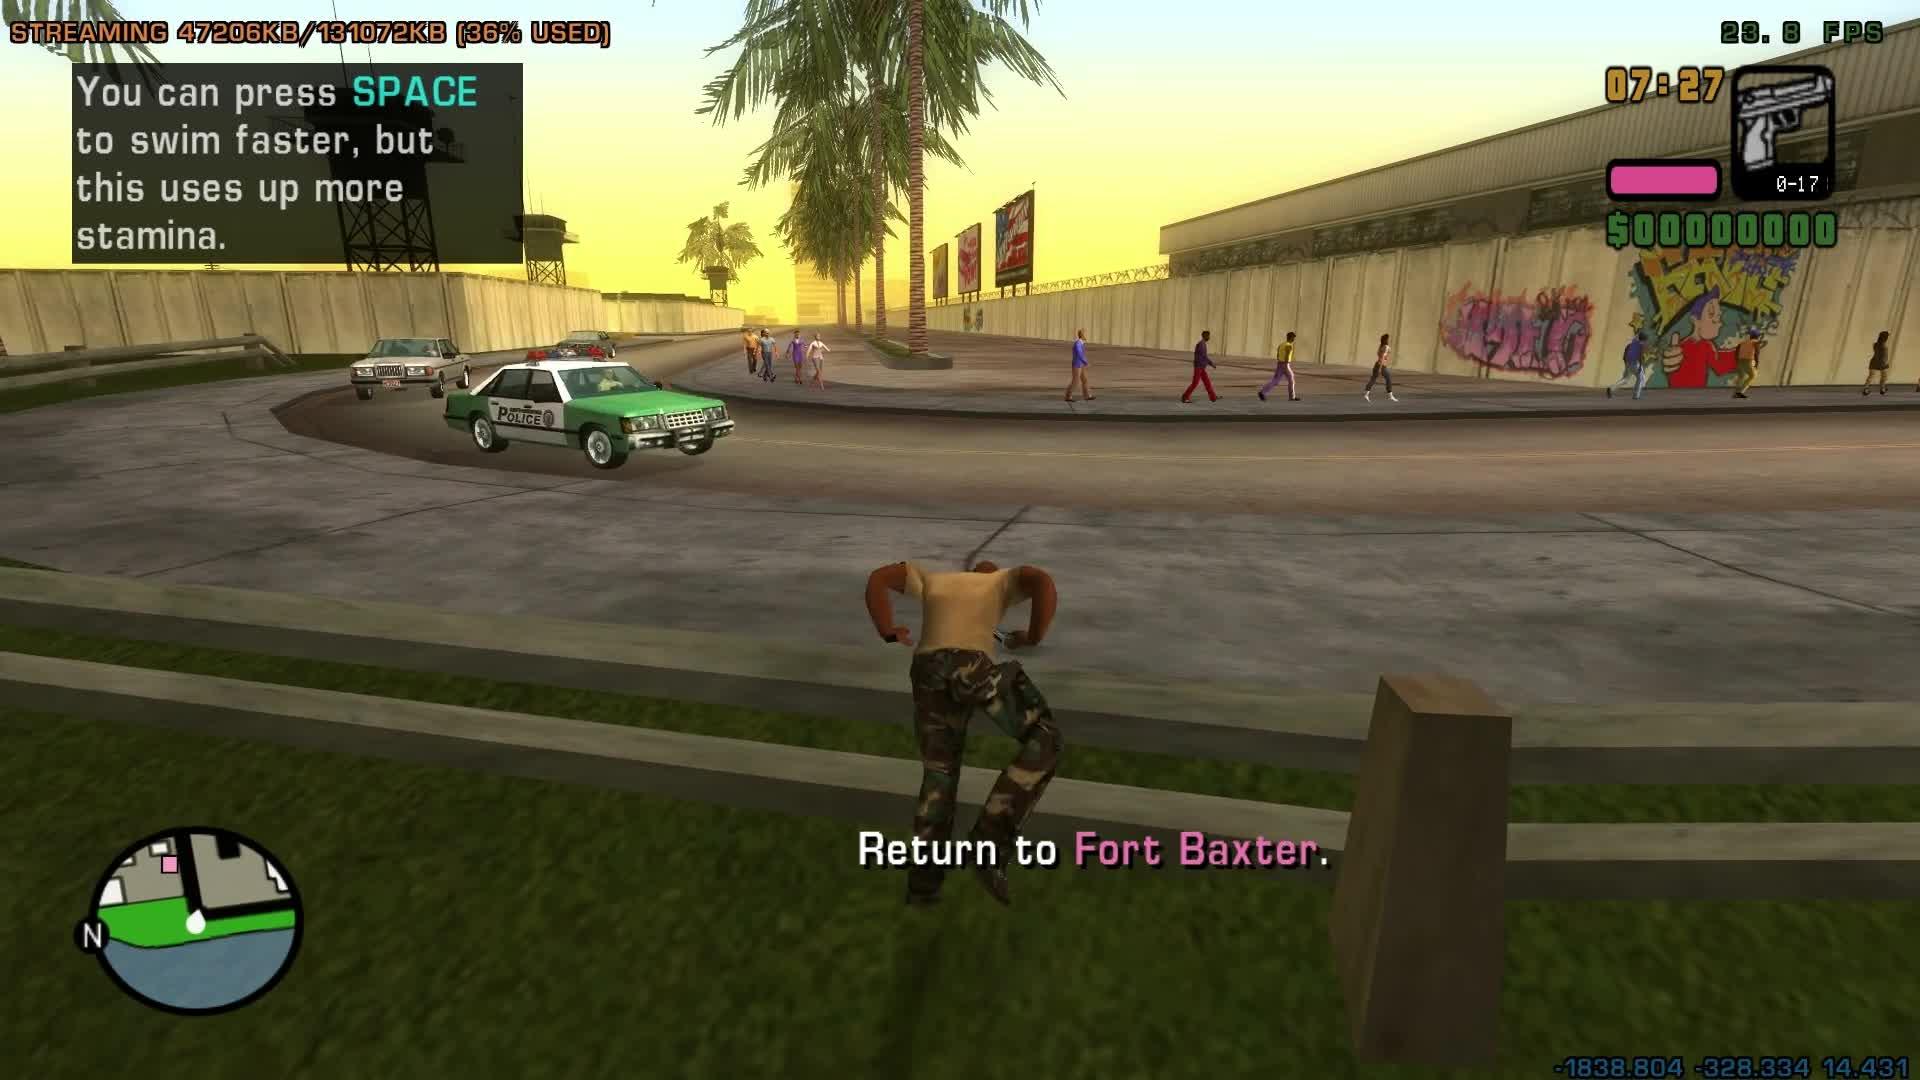 Fairground promo image vice city stories: pc edition mod for.